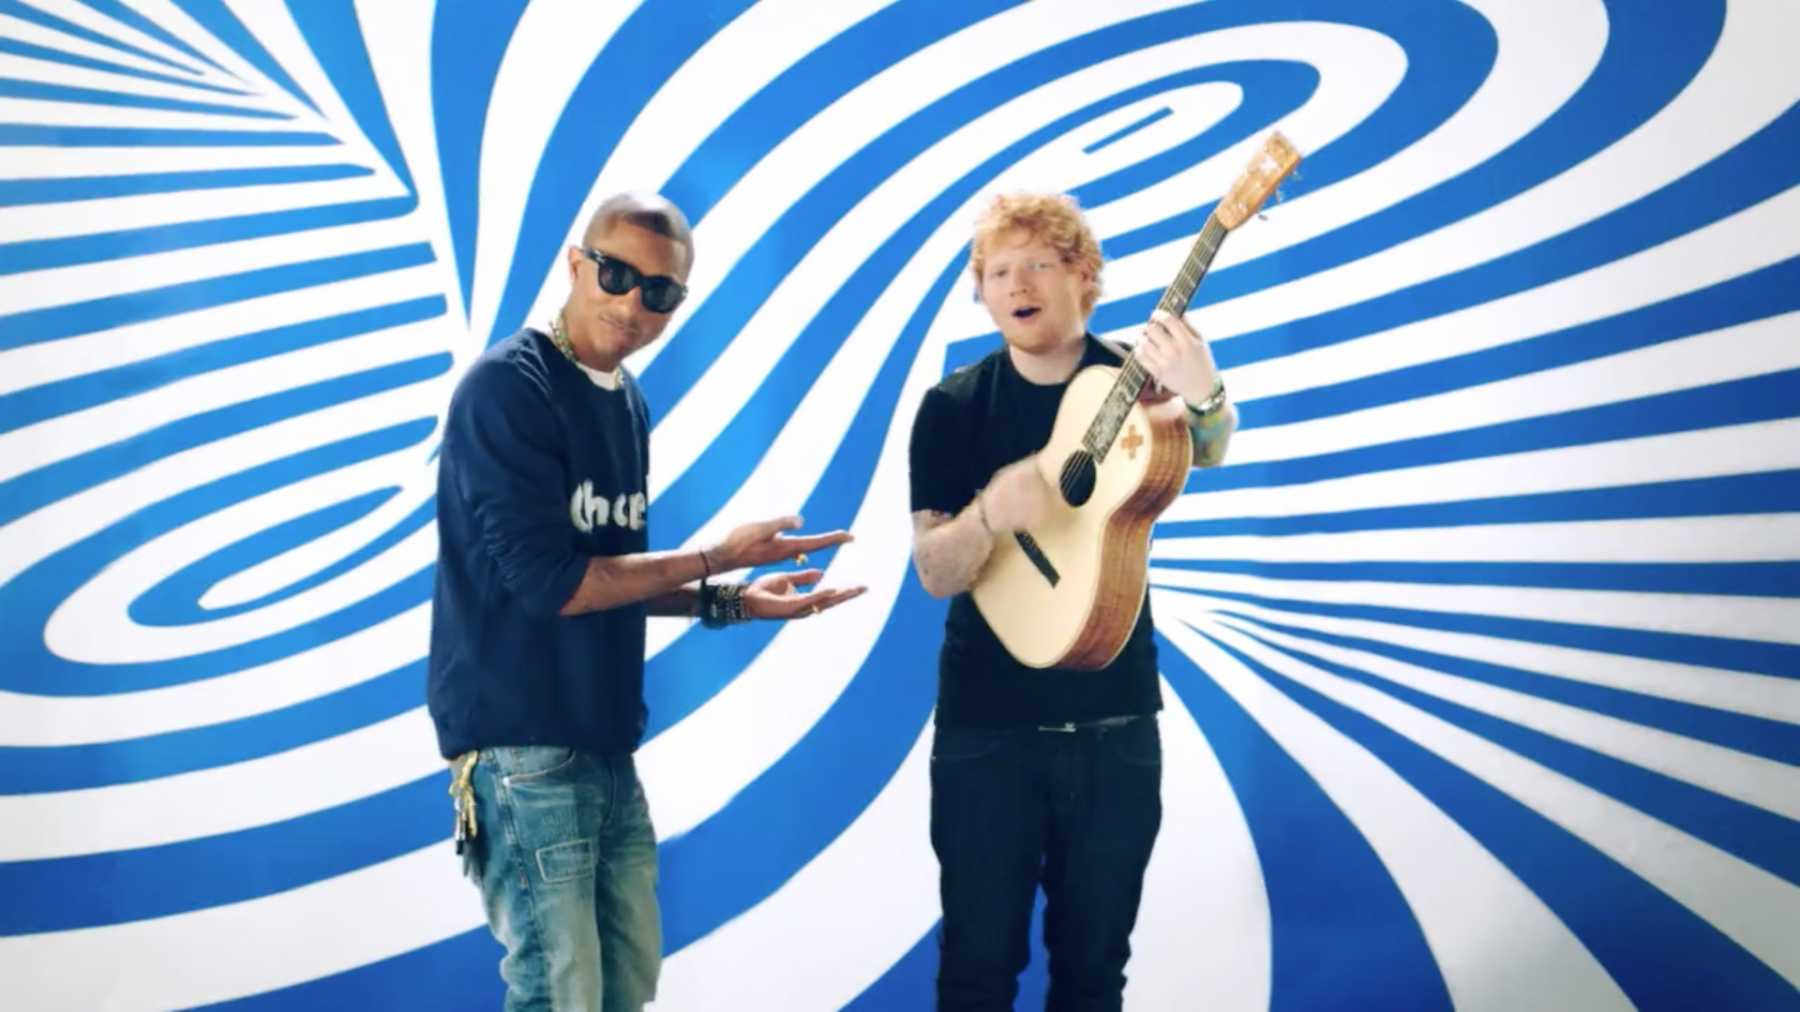 Ed Sheeran's New Album 'X' Released Today